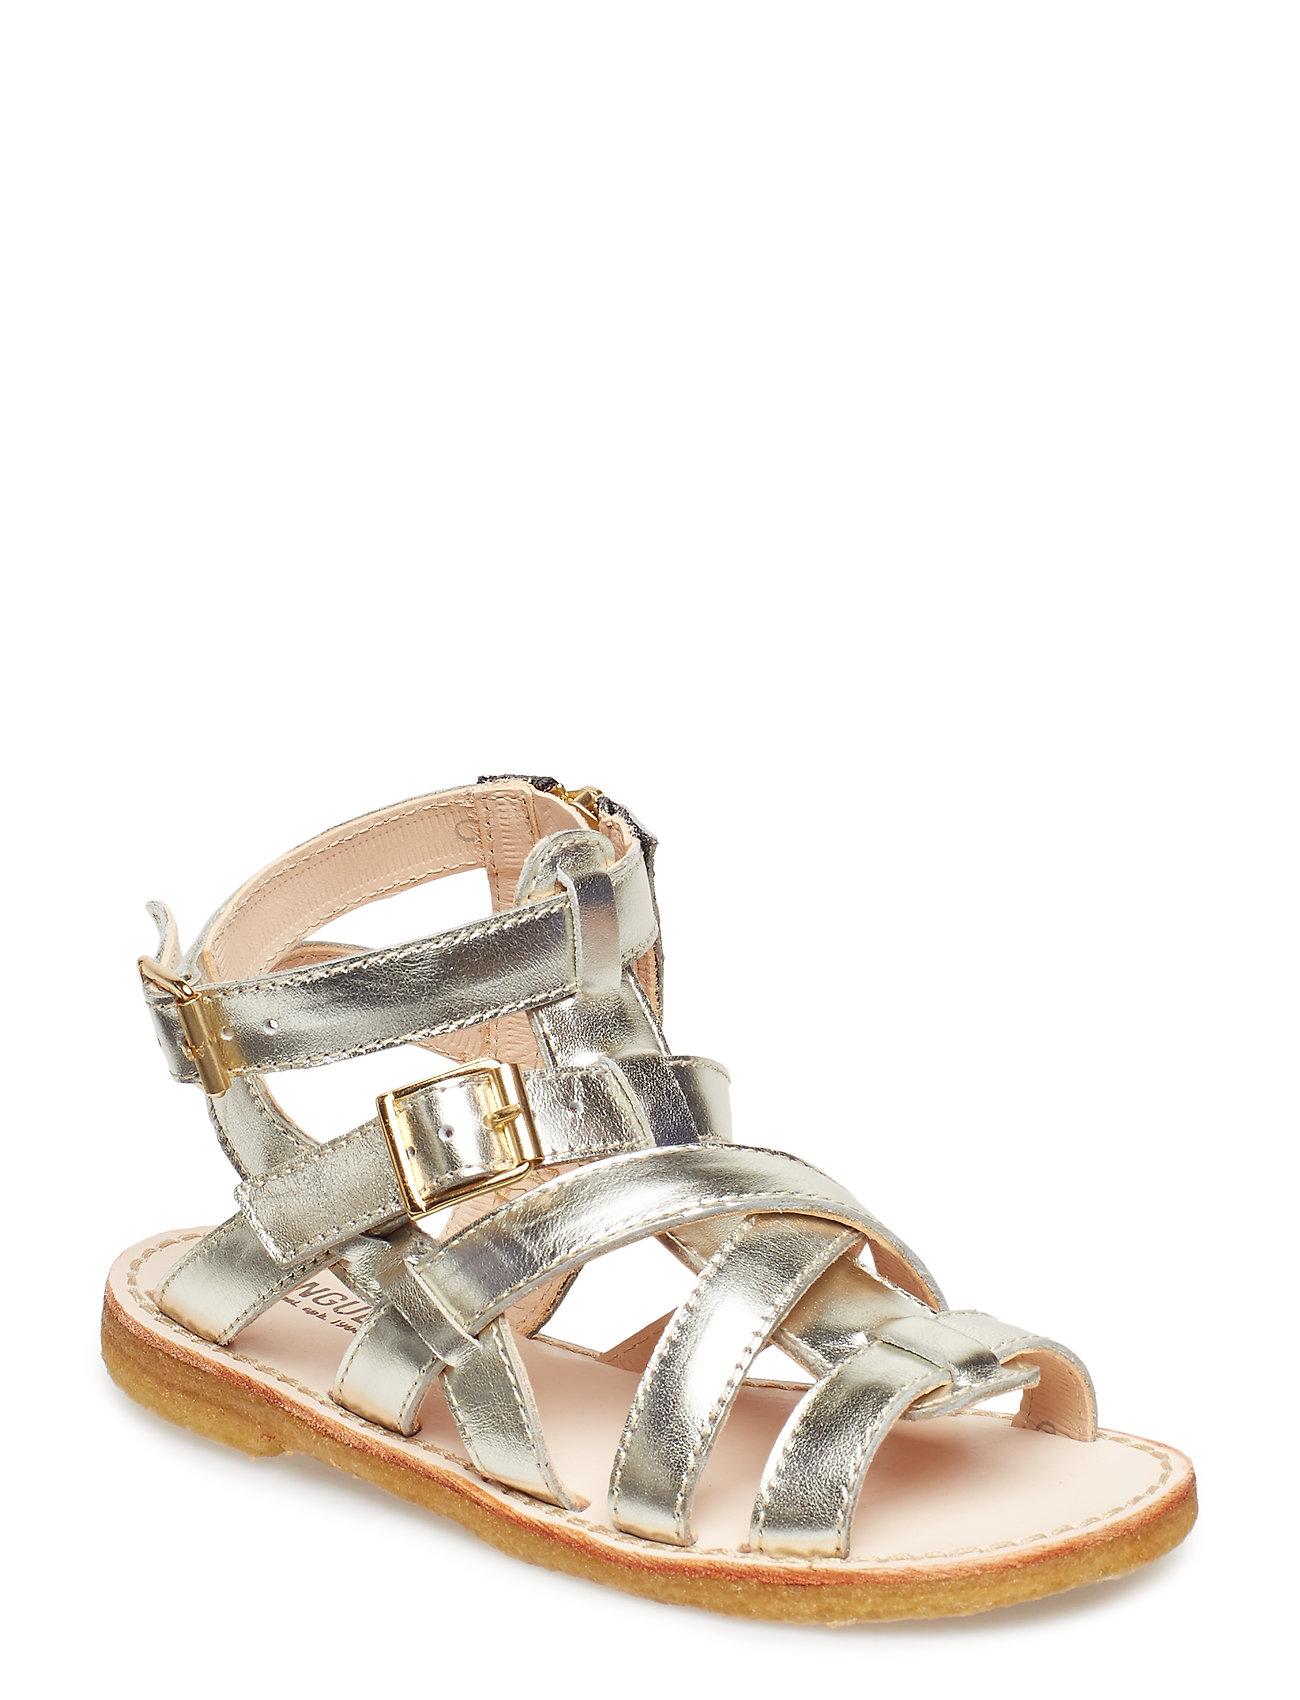 ANGULUS Sandal w. zipper - 1325 CHAMPAGNE